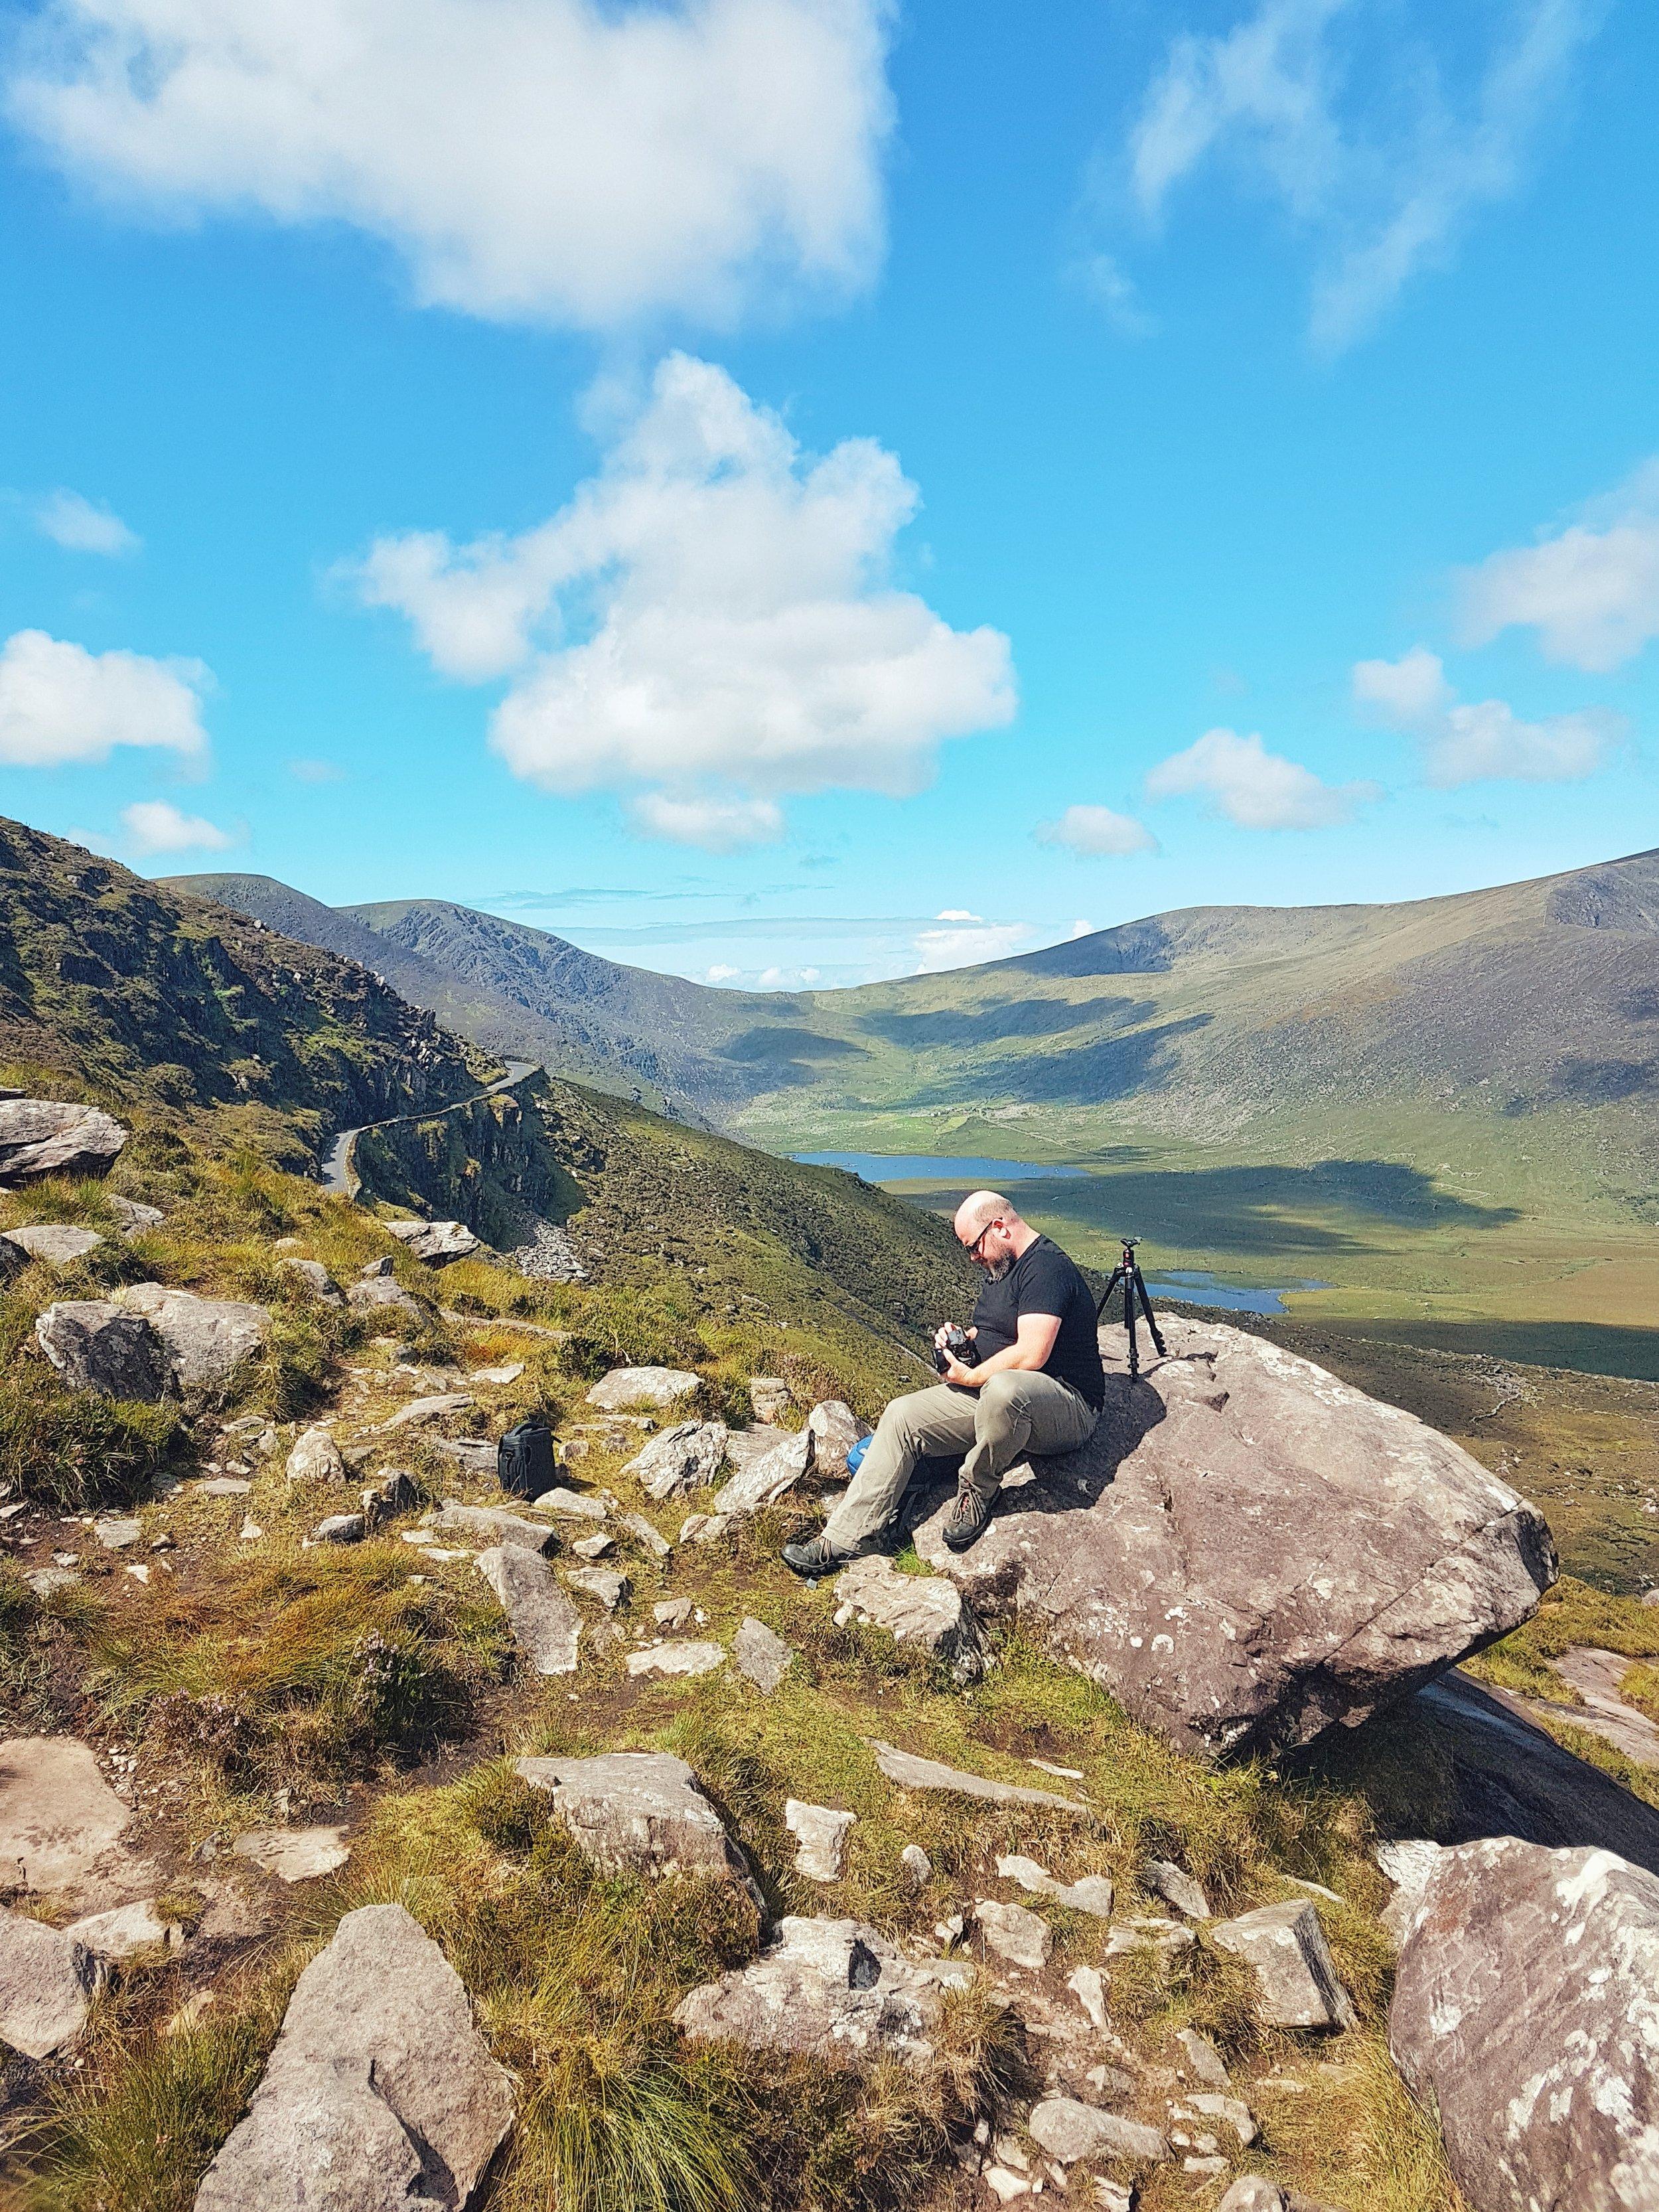 Ireland. Wild Atlantic Way. Kerry. Counthy Kerry. Travel photography. Landscape photography. Blog. Irish. Travelling Ireland. Ireland west coast. Wild Landscape. Trip. Vacation. .jpg